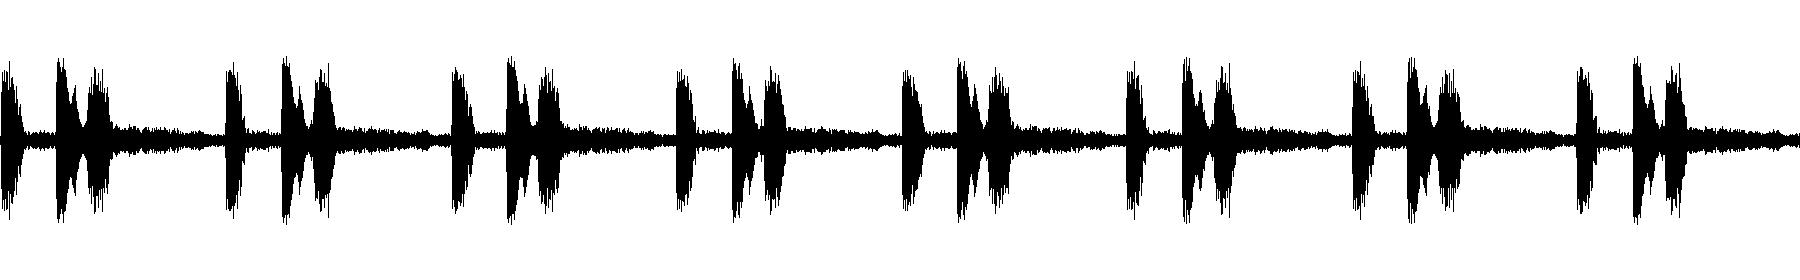 pth synth 23